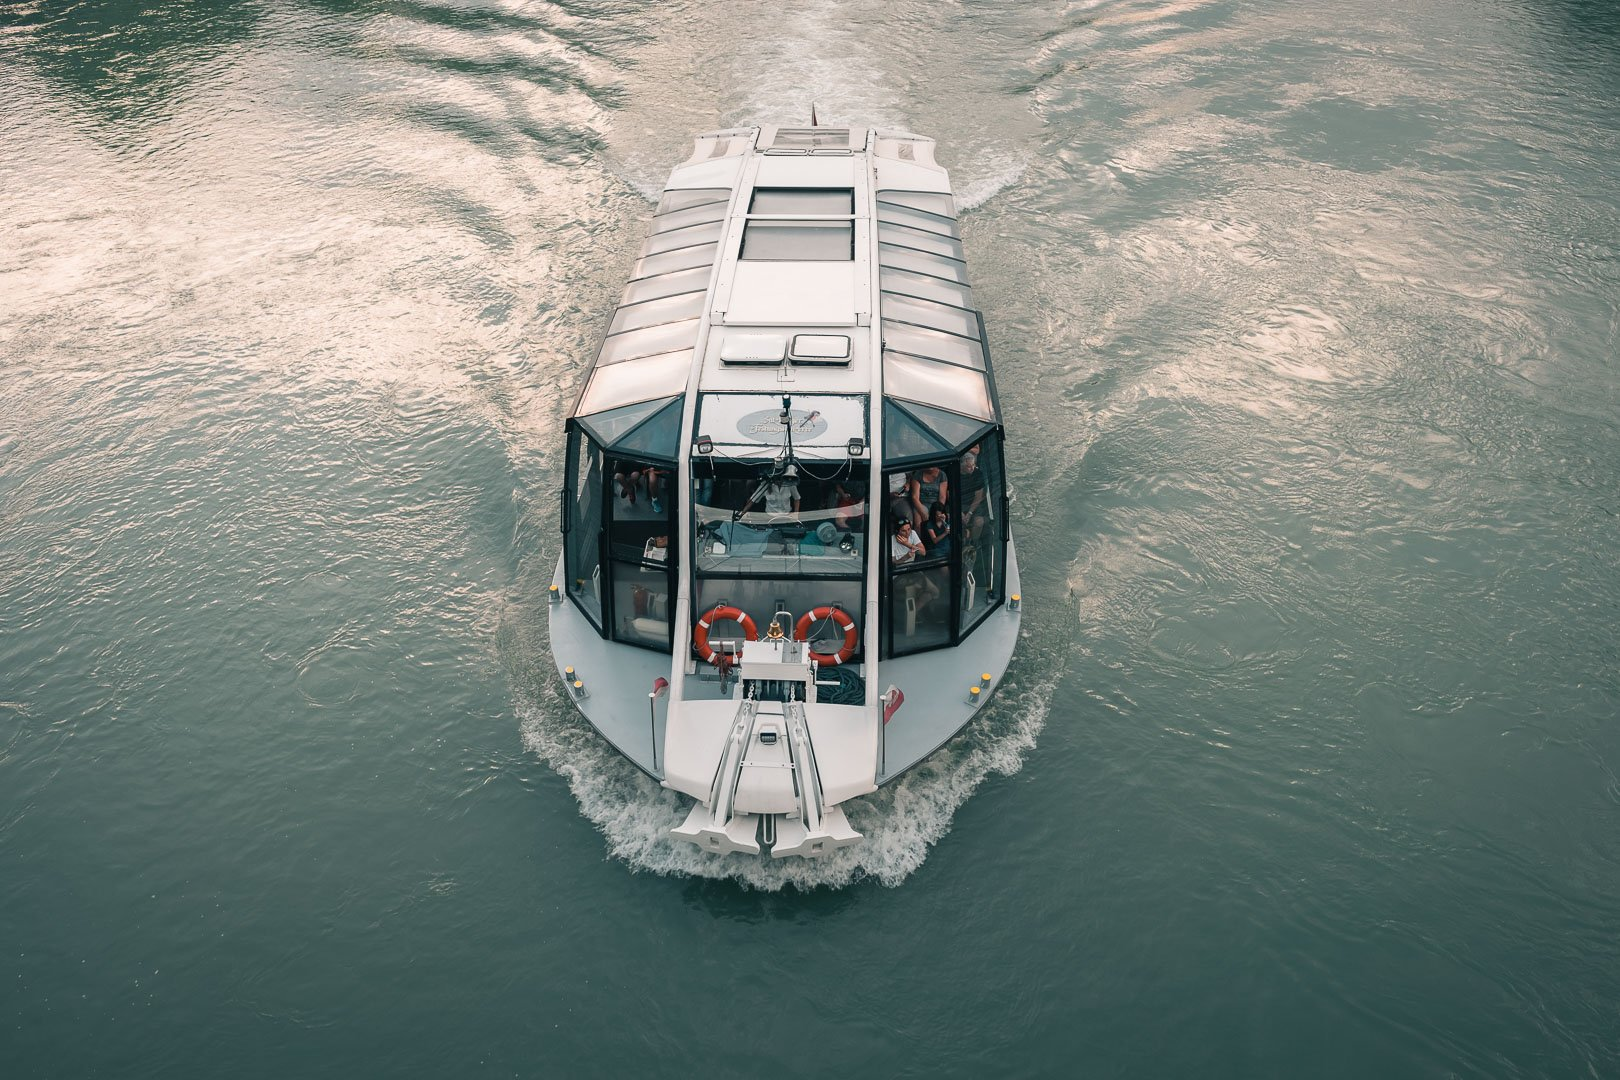 River Cruise Boat in Salzburg